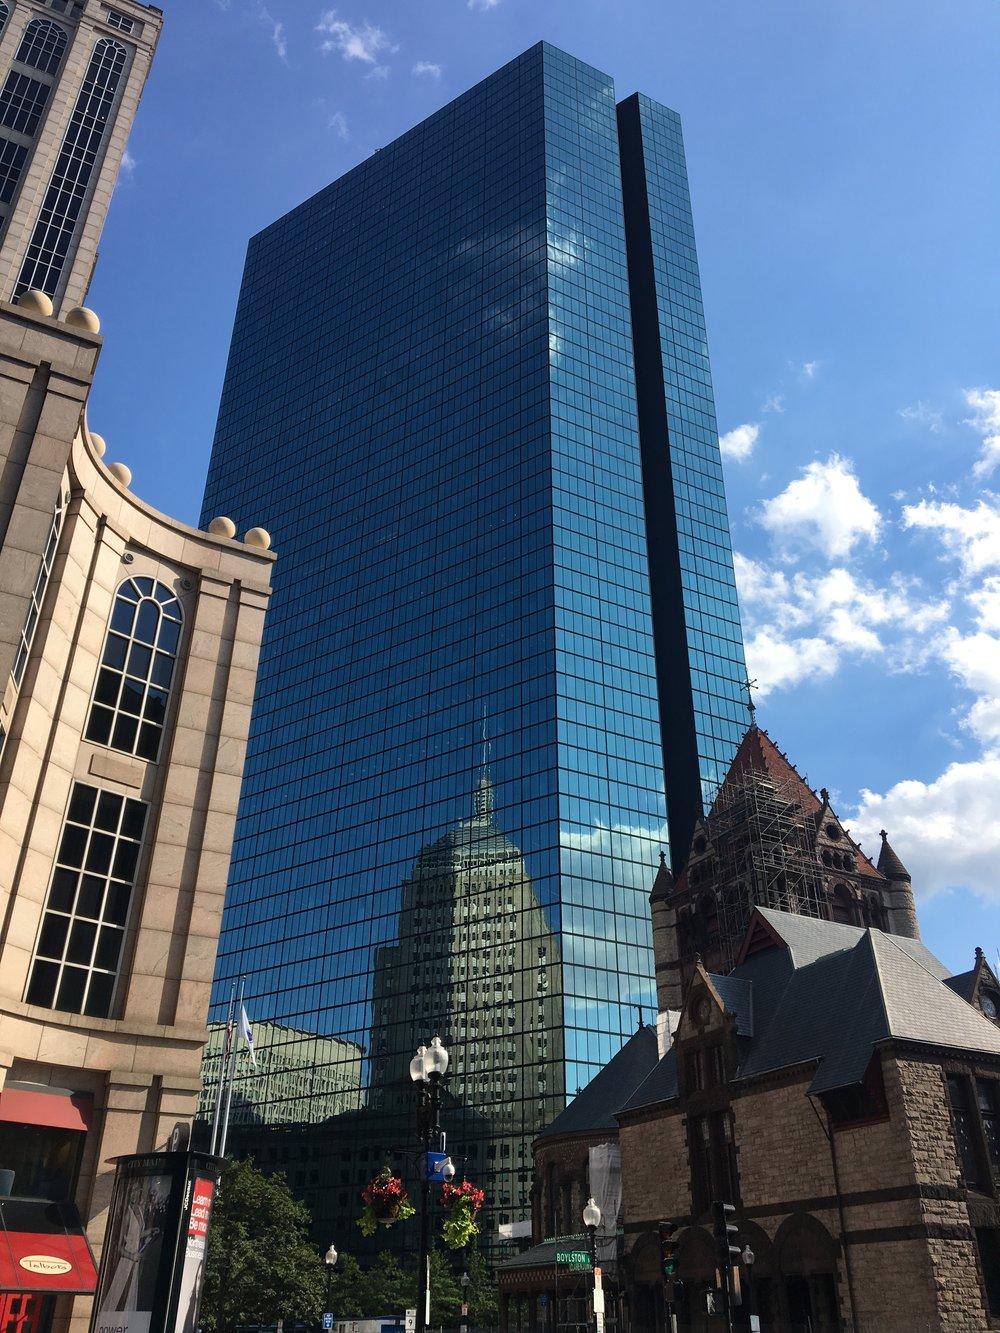 John Hancock Tower Boston.JPG